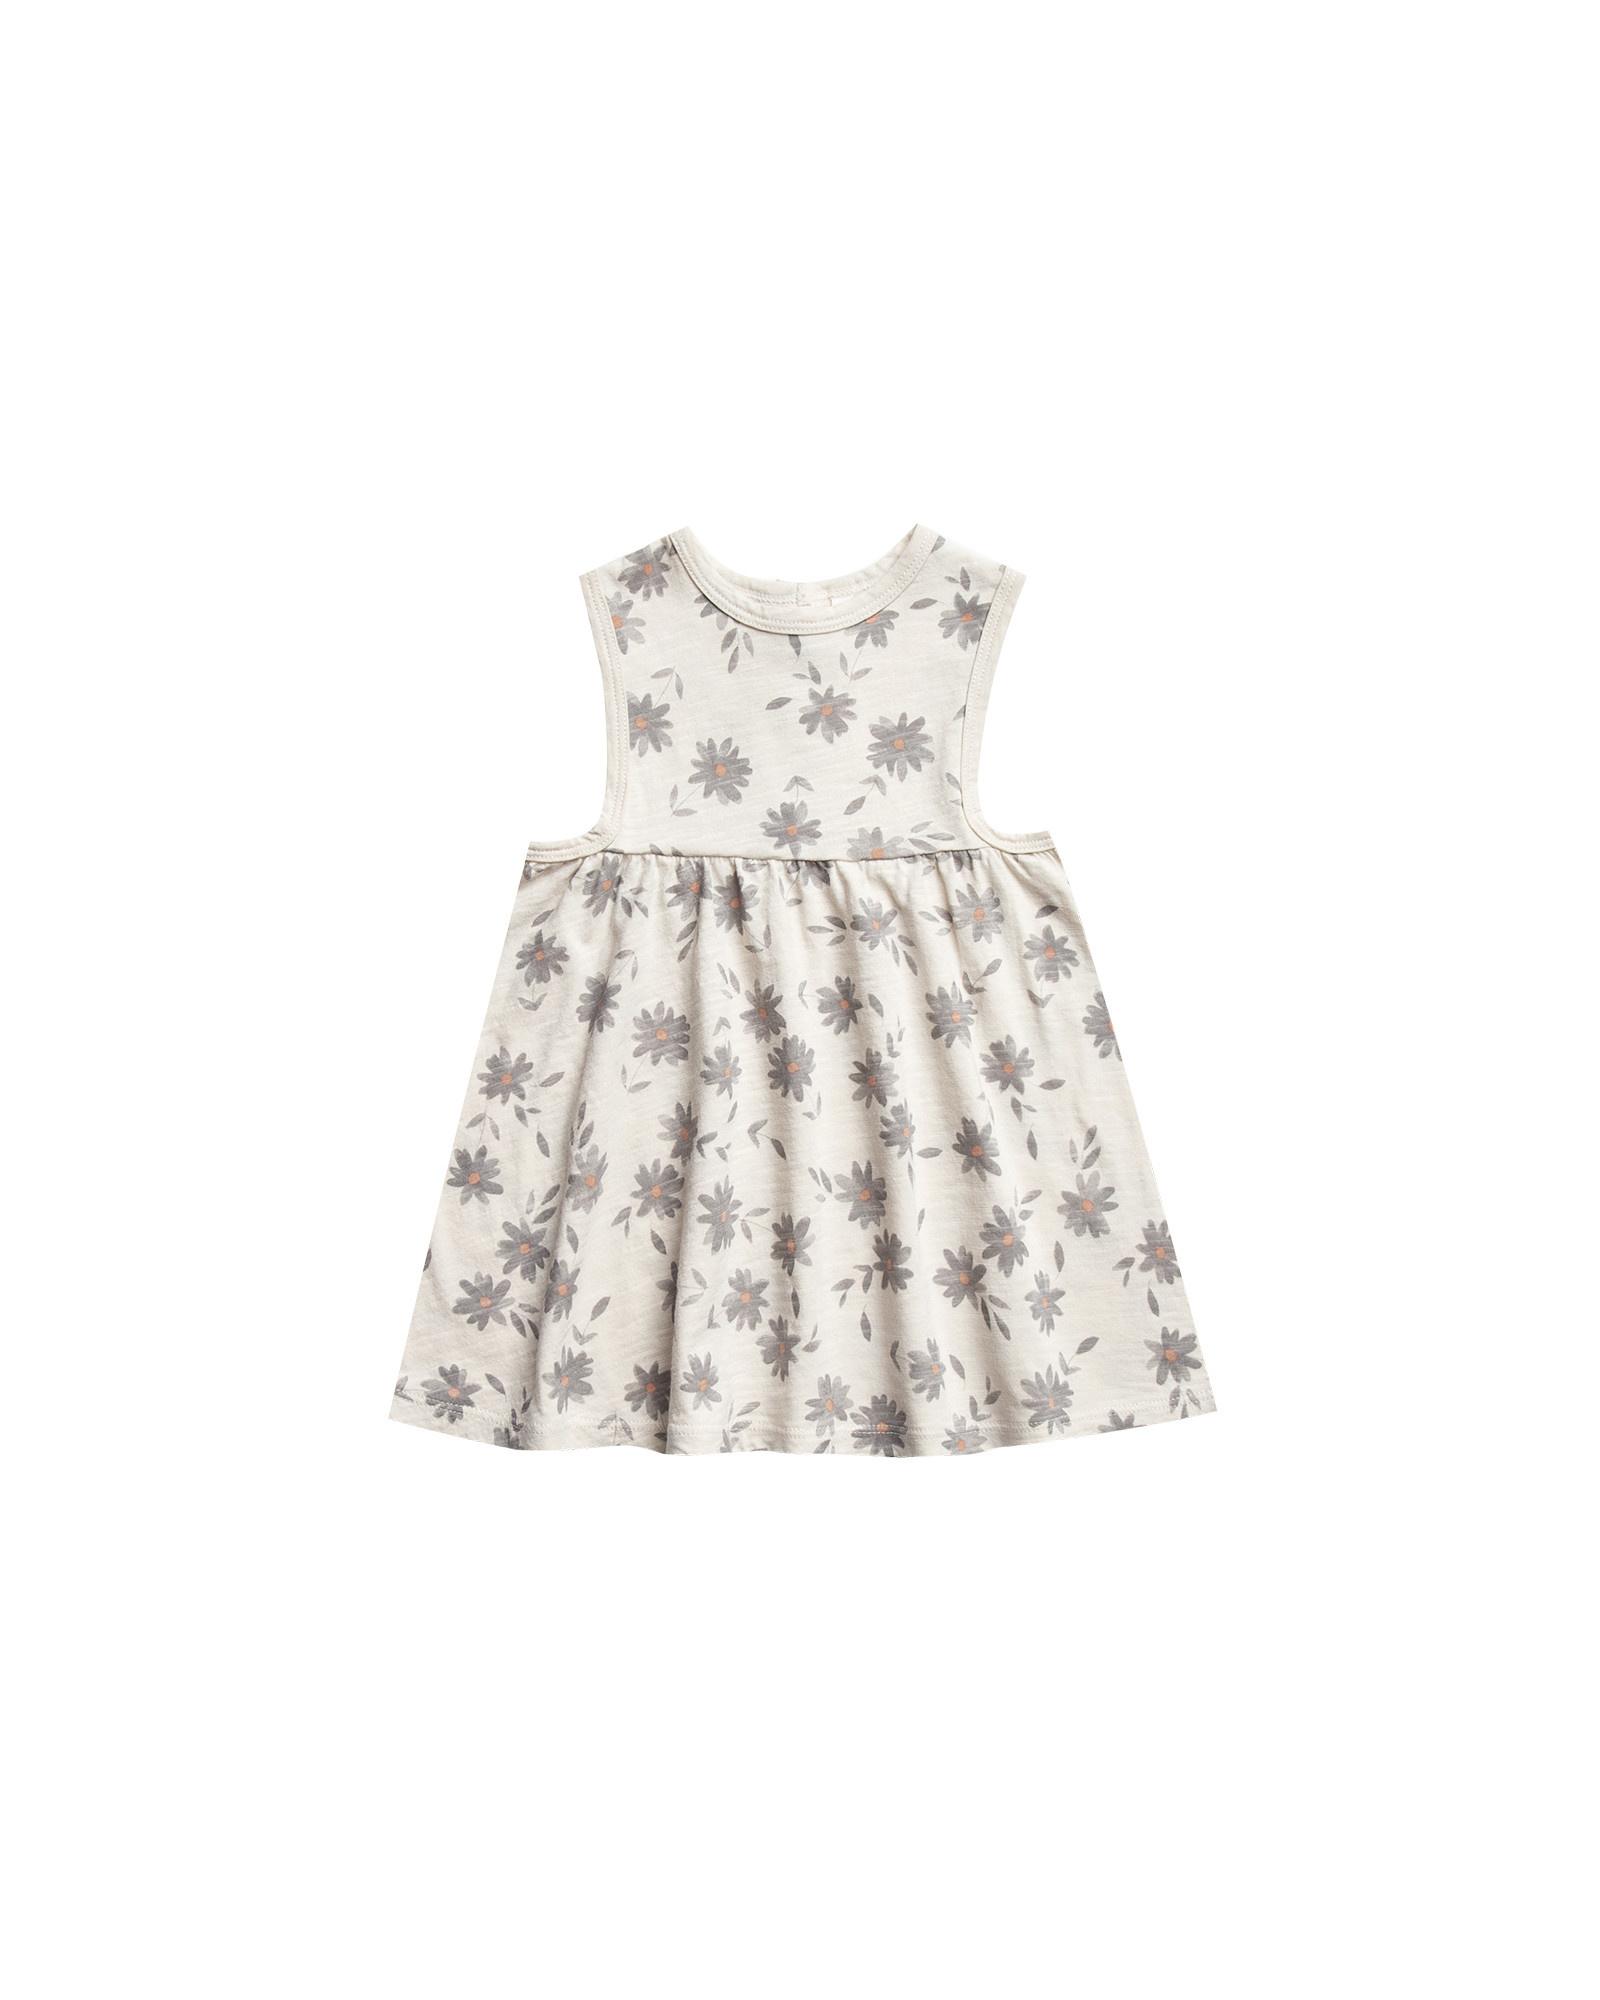 Rylee & Cru Daisies Layla Dress